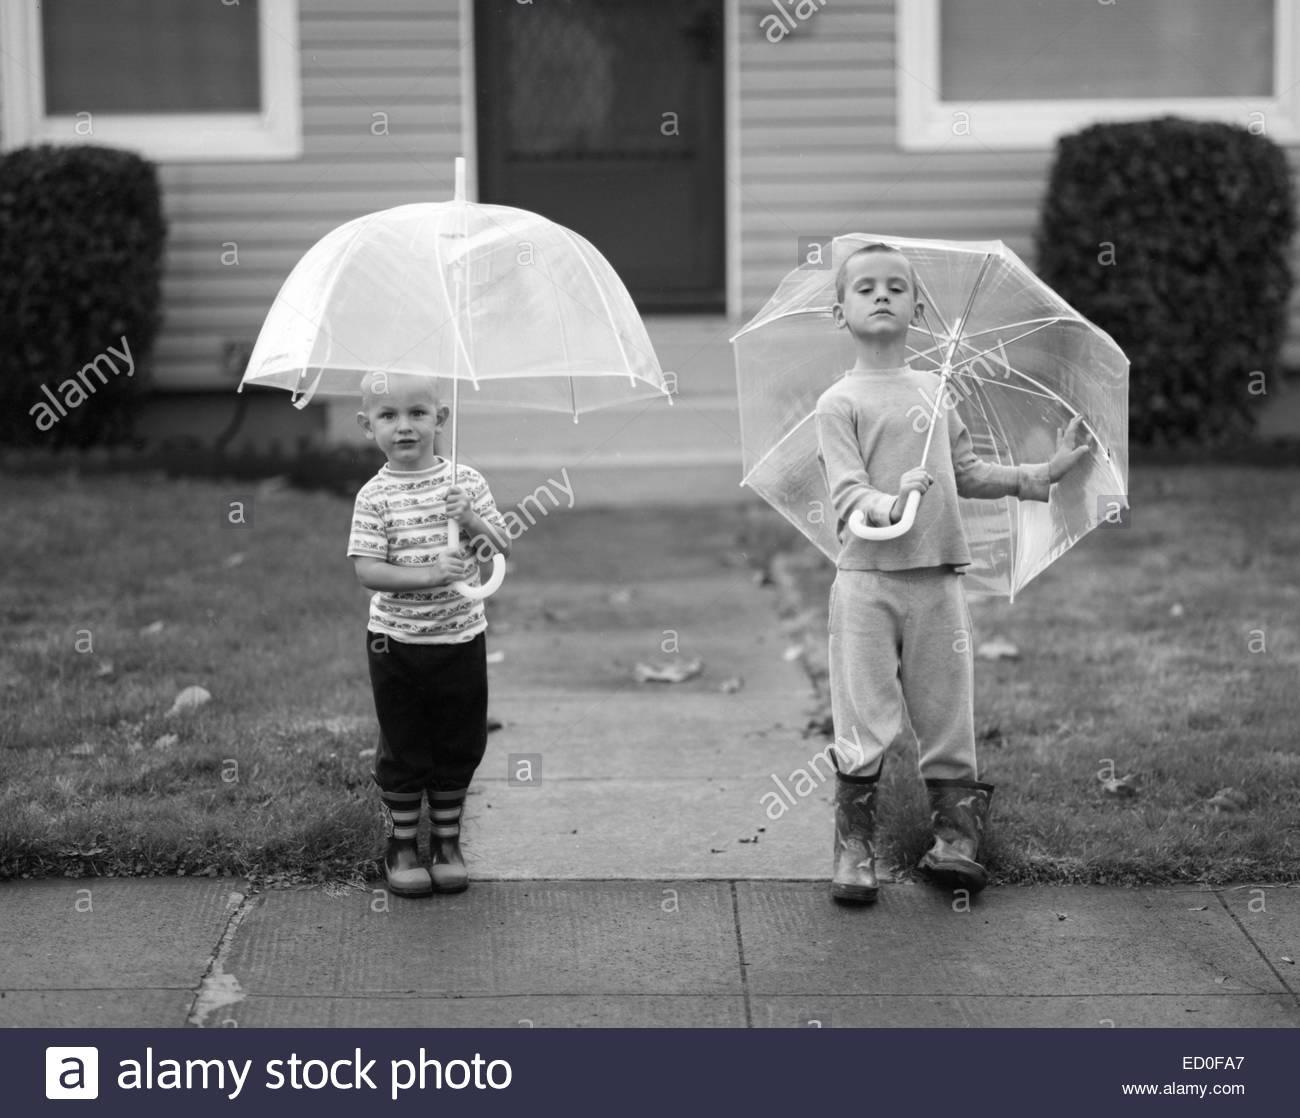 Brüder (2-3, 4-5) mit Sonnenschirmen, Portland, Oregon, USA Stockbild